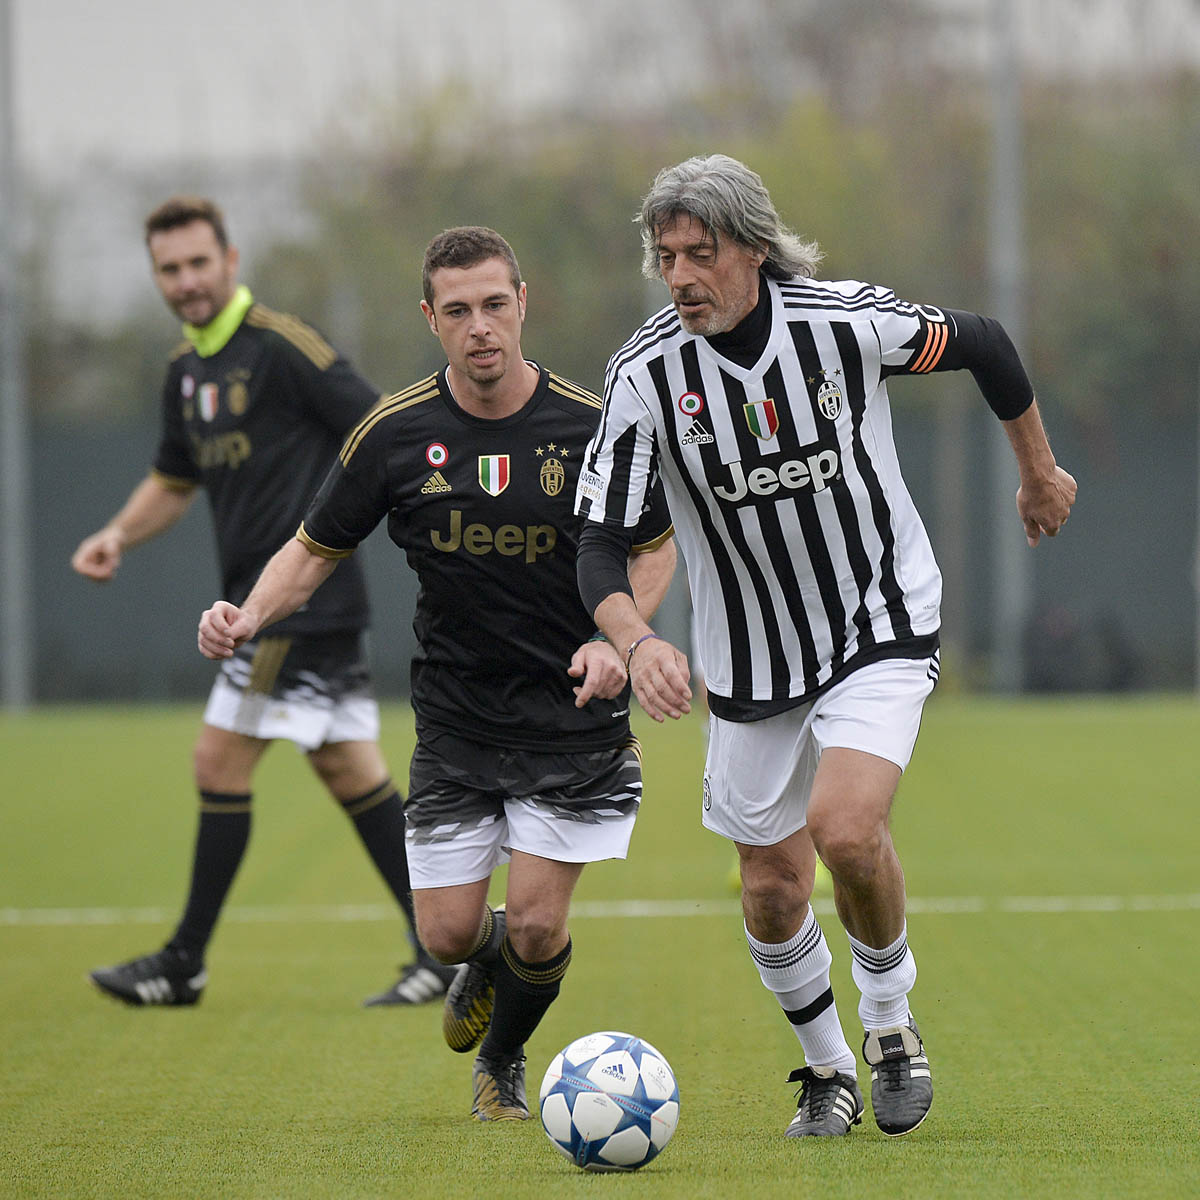 La Cote des Montres : Photo - Hublot Big Bang Unico Bi-Retrograde Juventus